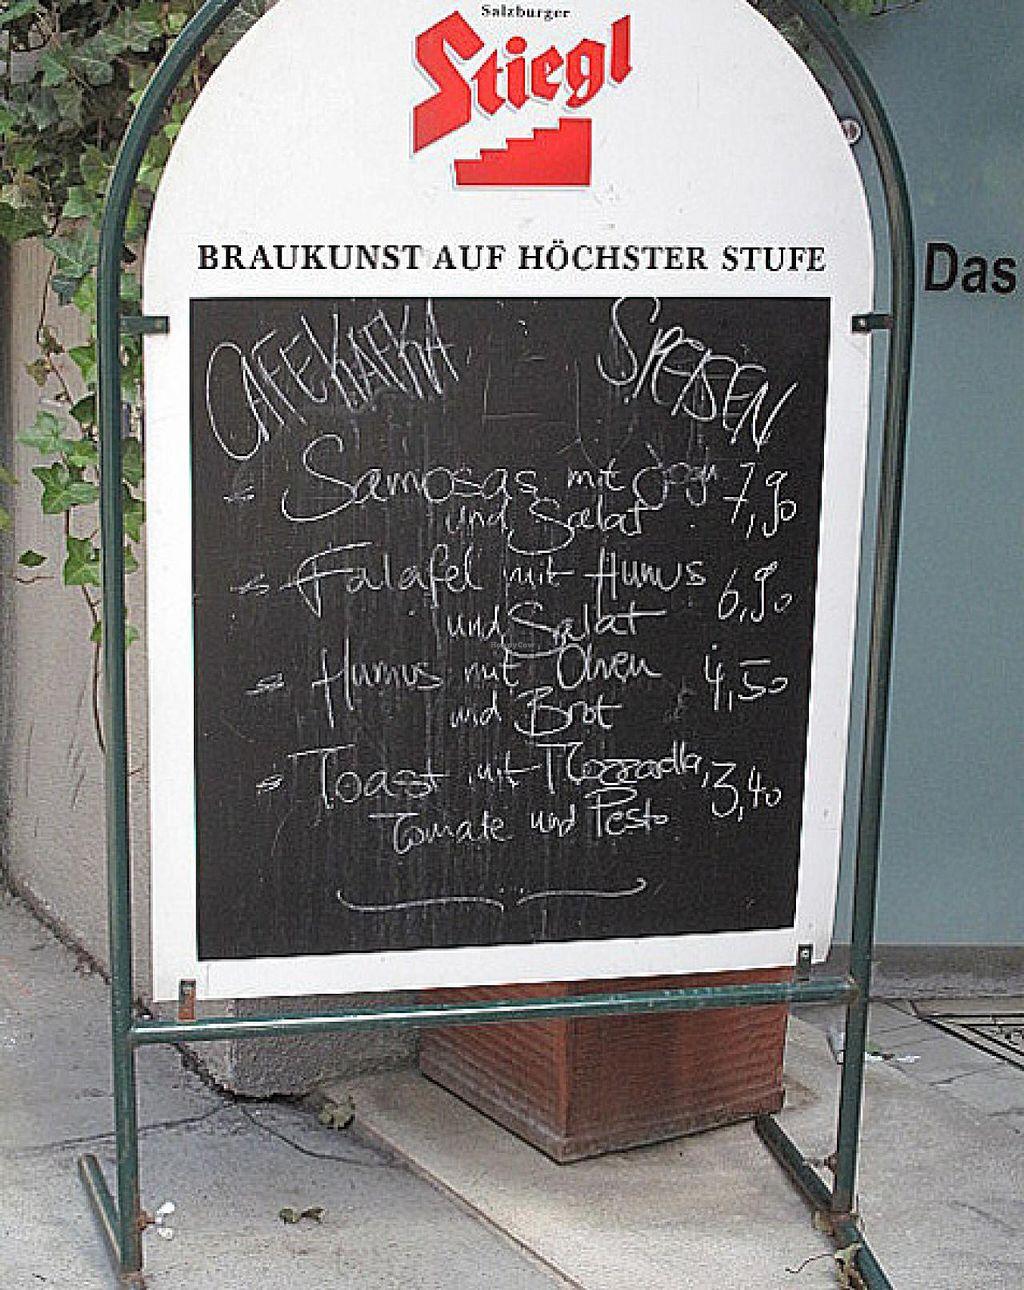 "Photo of Cafe Kafka  by <a href=""/members/profile/lallilaranja"">lallilaranja</a> <br/>menu <br/> July 23, 2014  - <a href='/contact/abuse/image/5255/74789'>Report</a>"